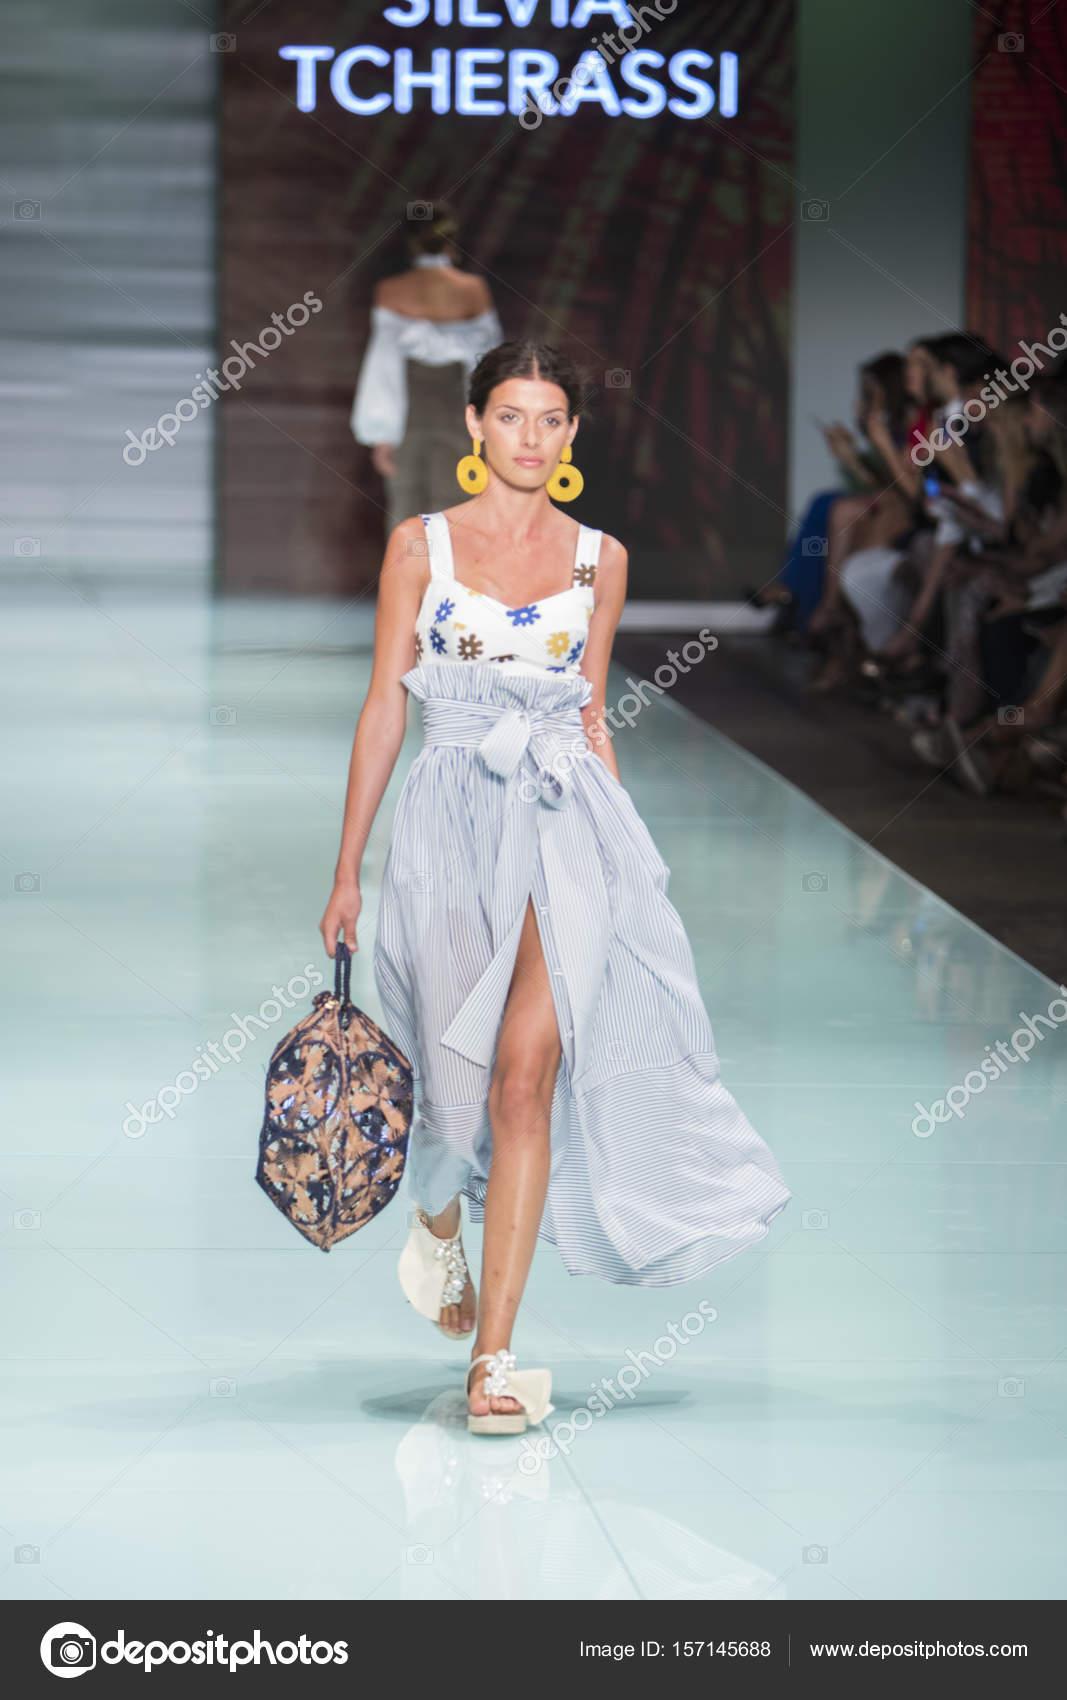 Silvia Tcherassi Fashion Sow 2017 – Stock Editorial Photo ...